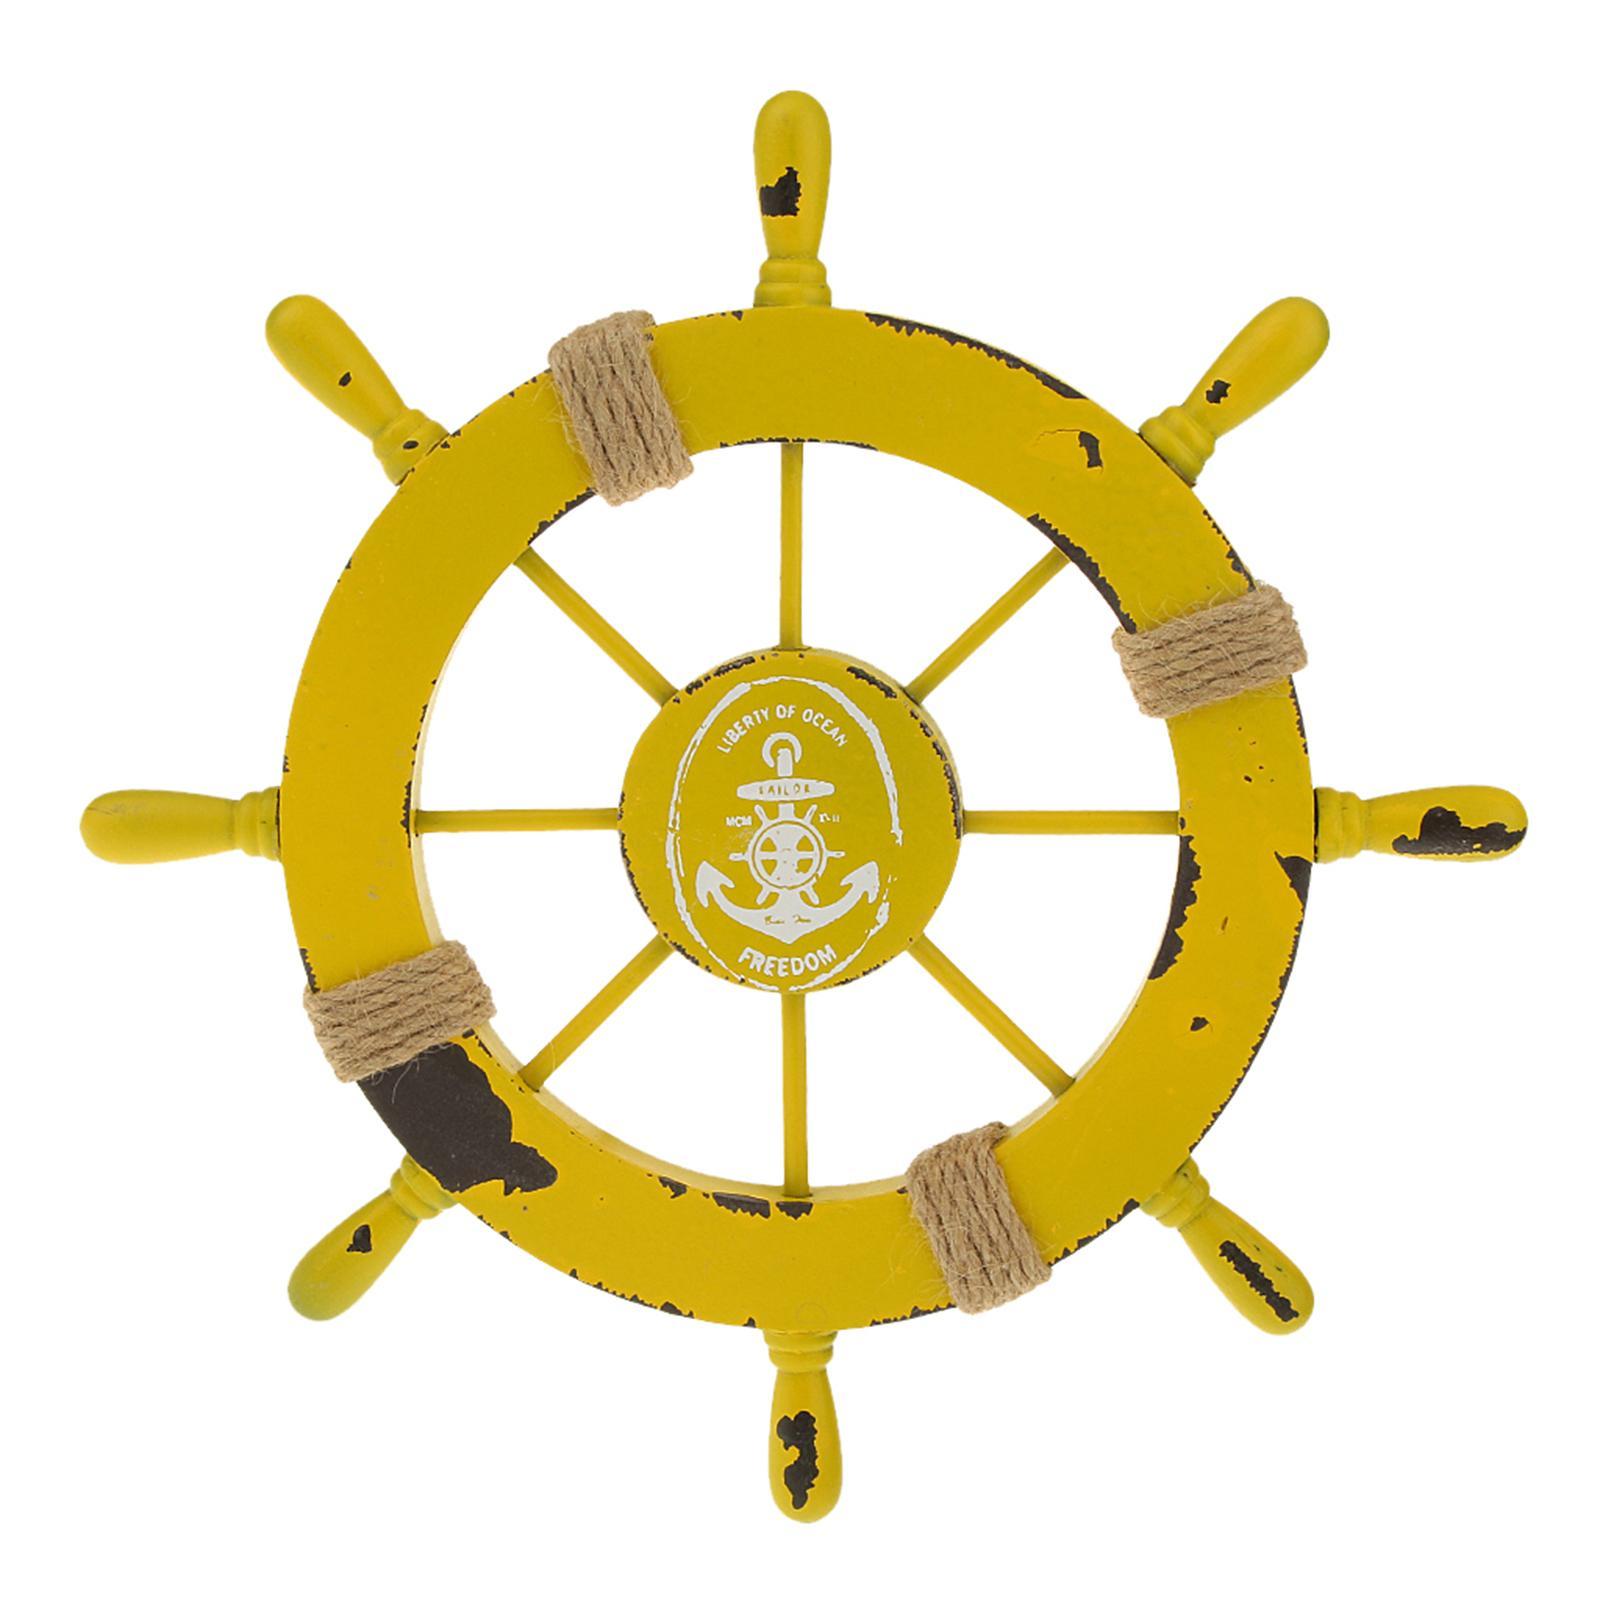 Nautical Beach Wooden Boat Ship Wheel Rudder Home Wall Hanging Decor Yellow